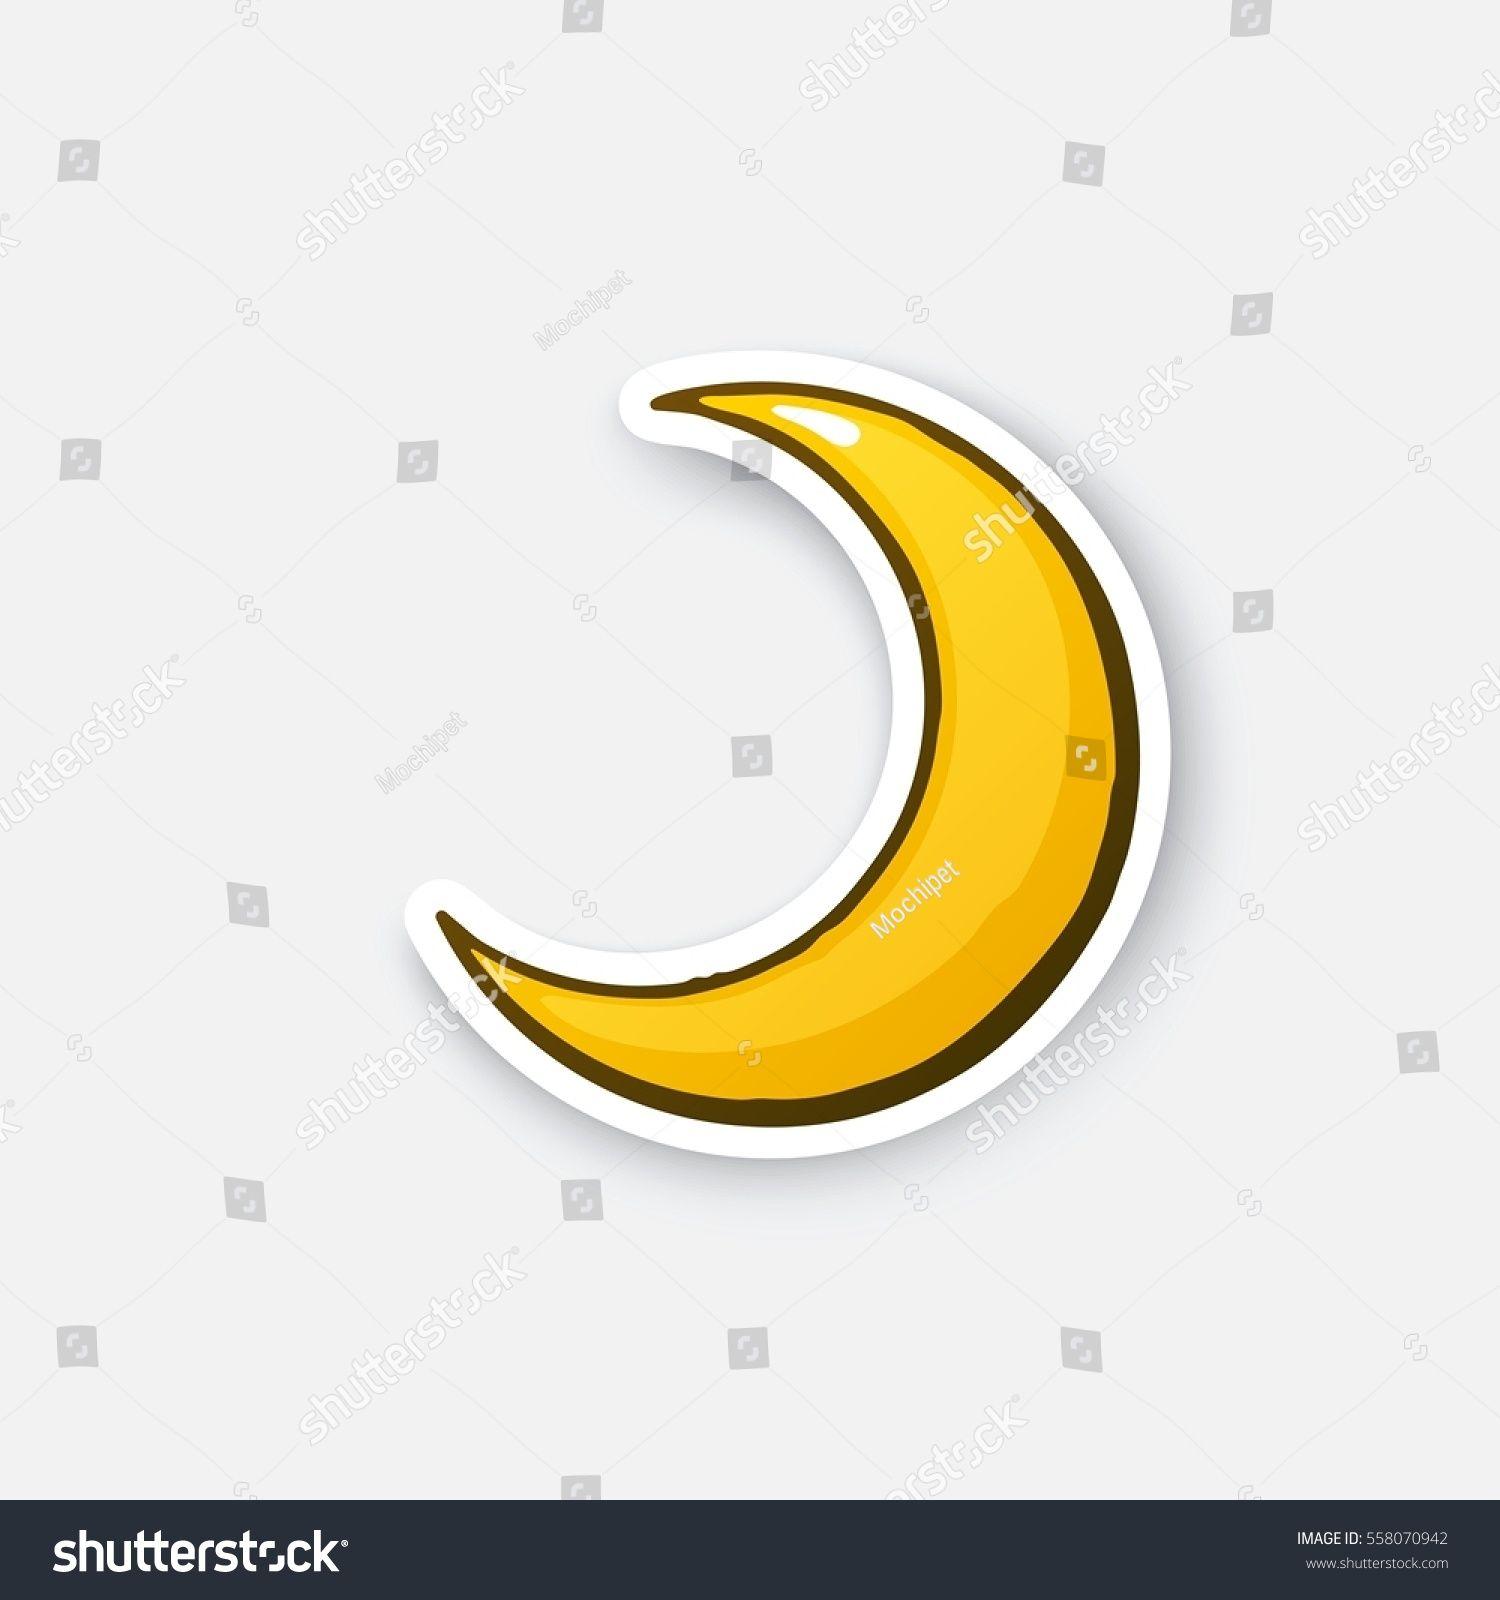 Vector Illustration Golden Crescent Cartoon Half Moon Sticker In Comic Style With Contour Decoration For Greeting C Vector Illustration Illustration Vector